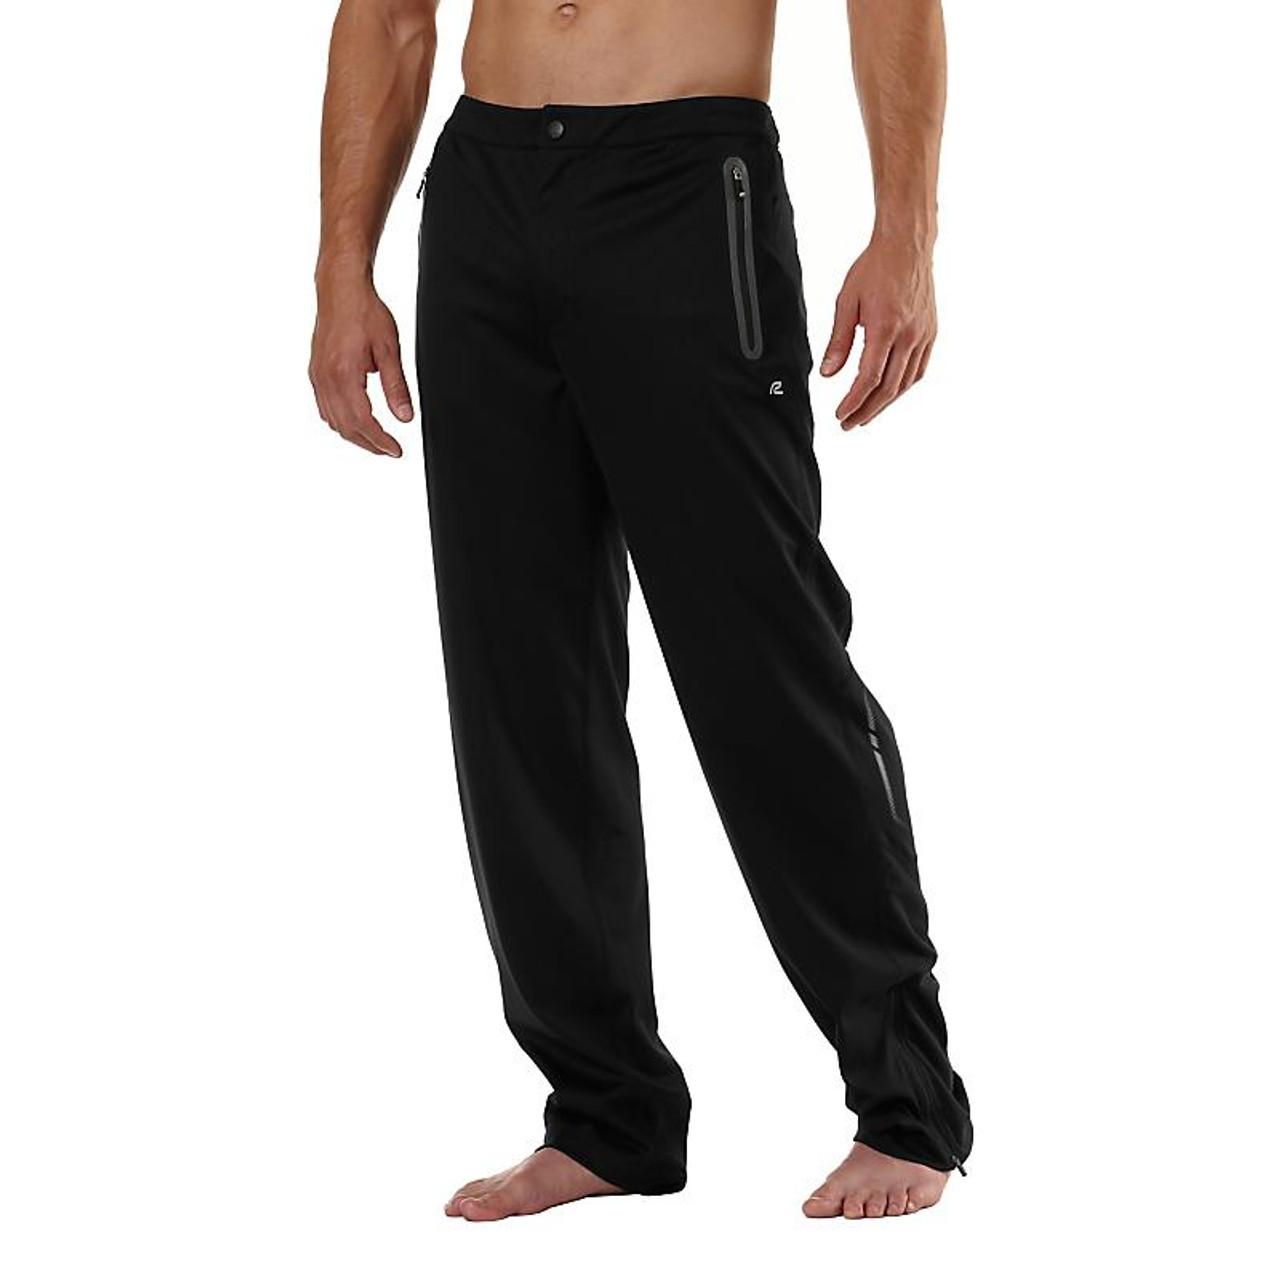 Men's R-Gear Second Wind Pant